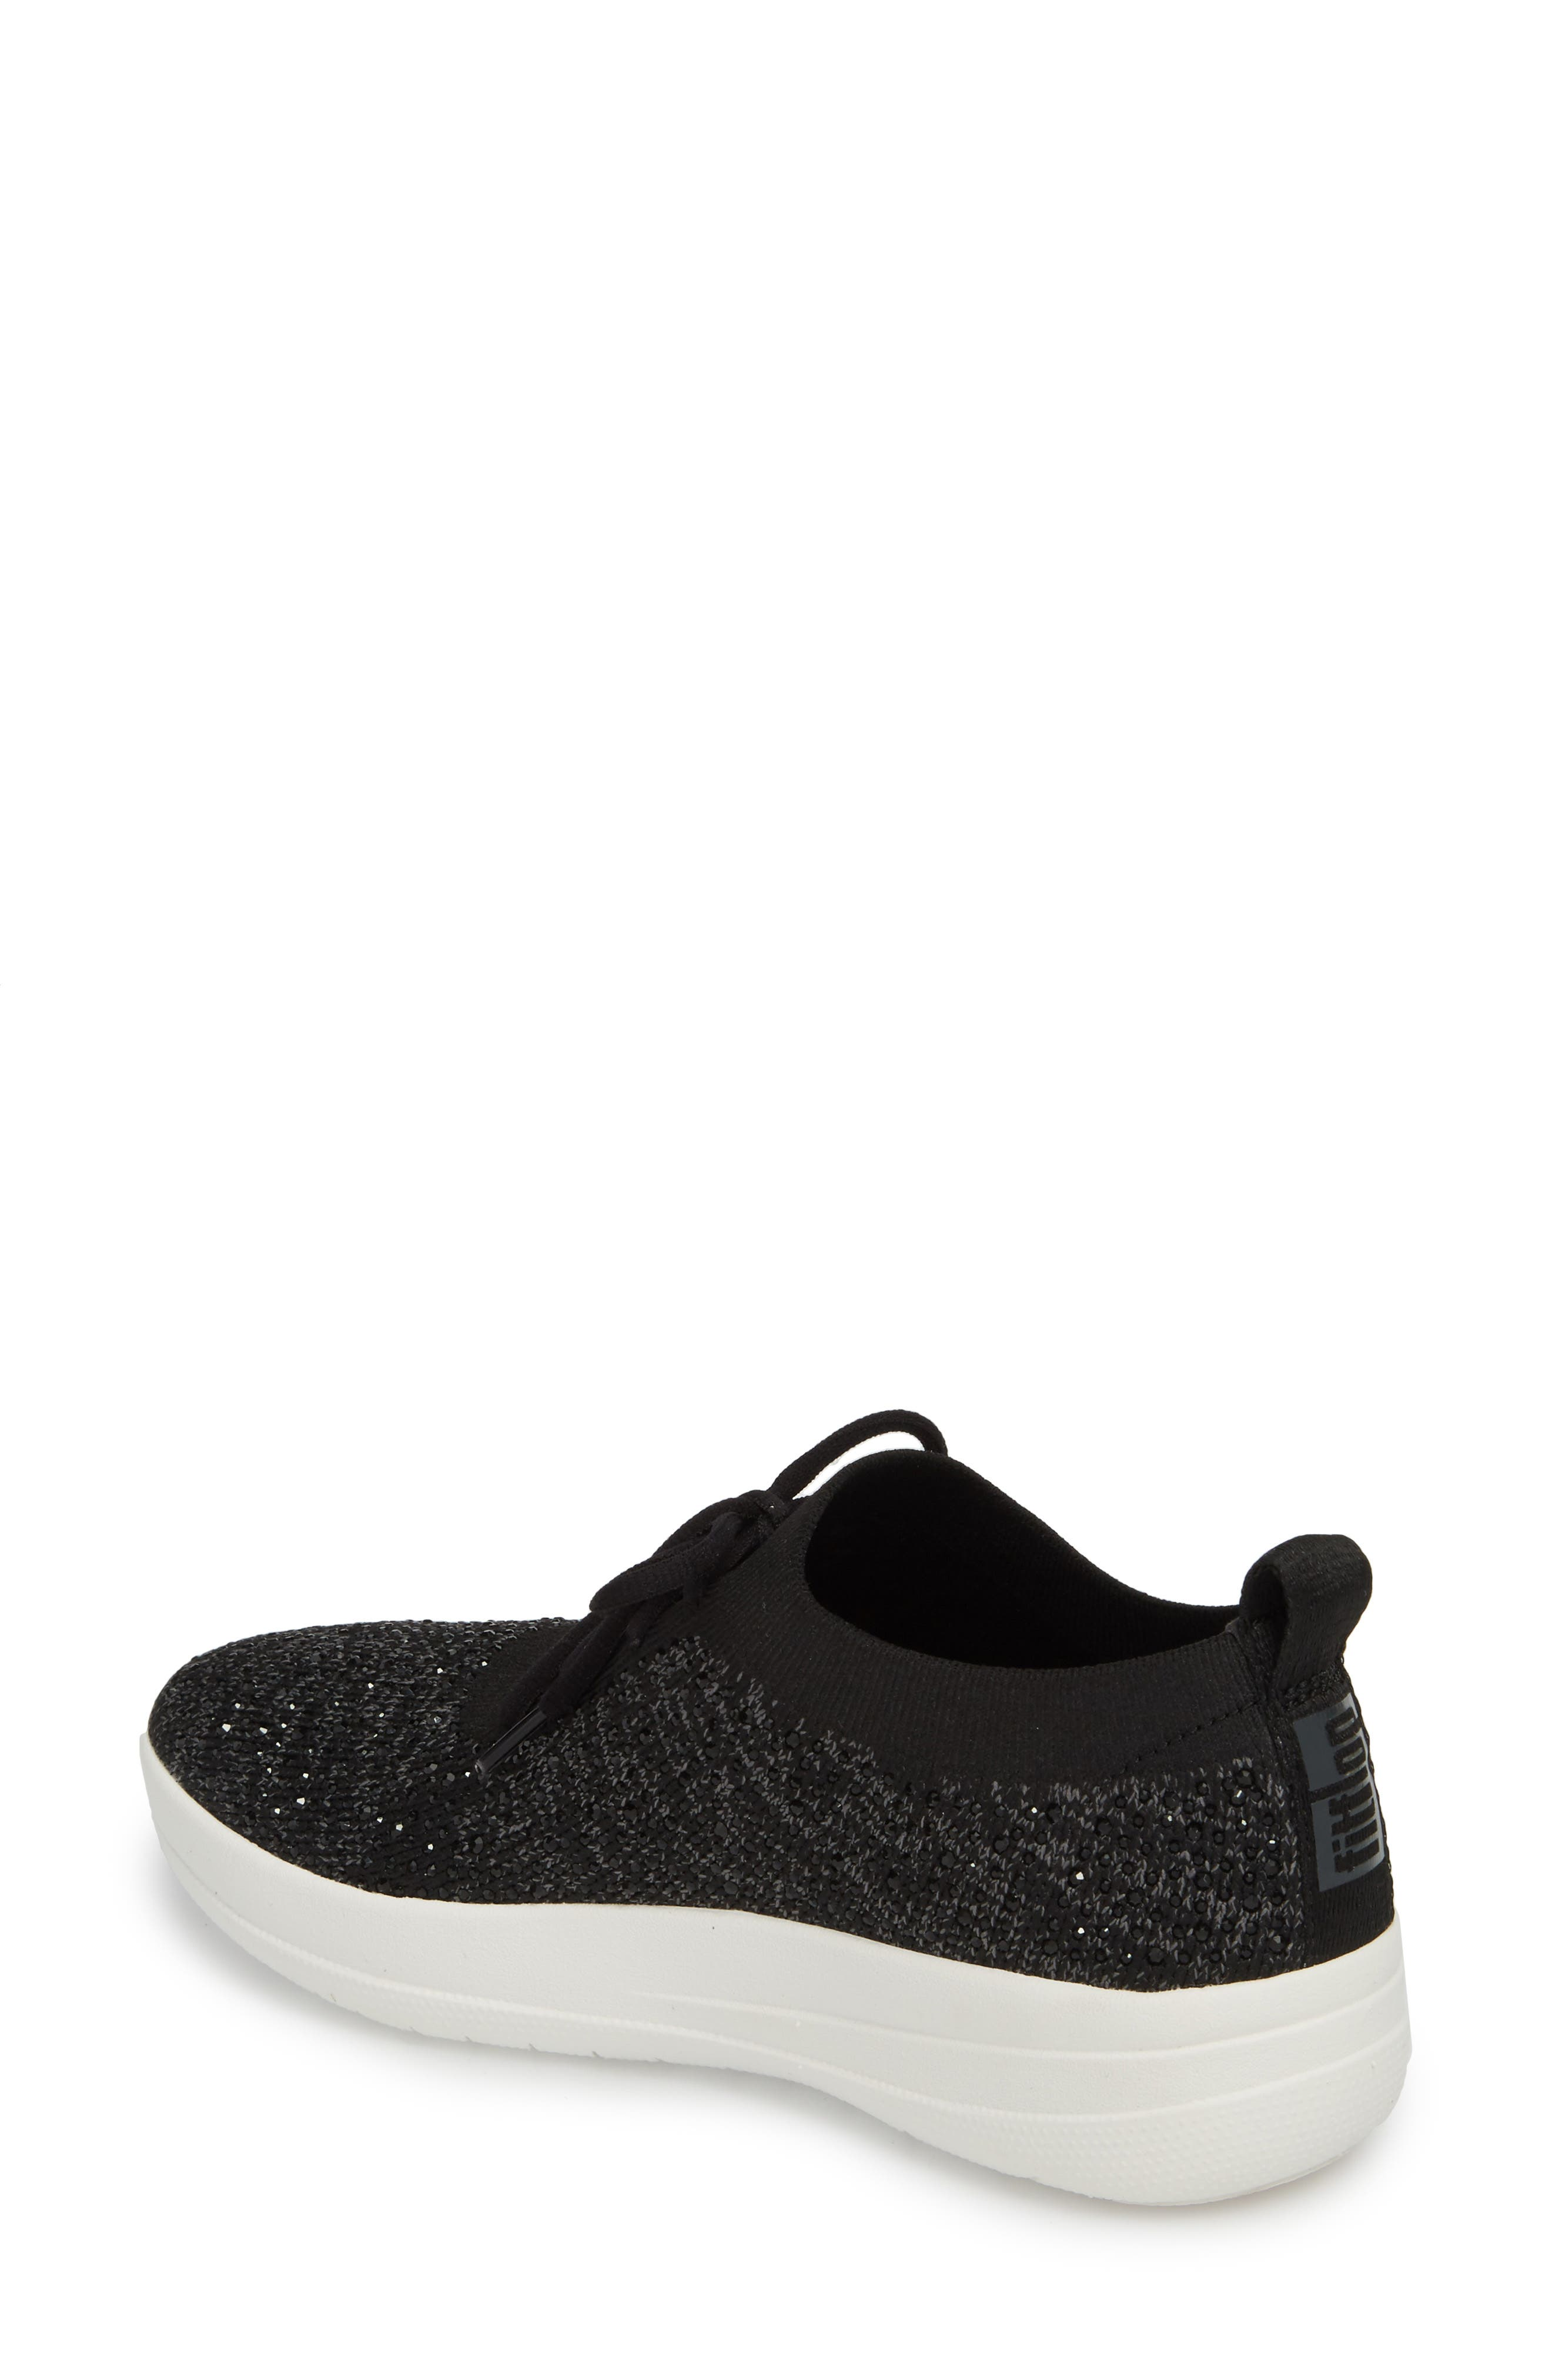 Uberknit<sup>™</sup> F-Sporty Sneaker,                             Alternate thumbnail 2, color,                             BLACK LEATHER